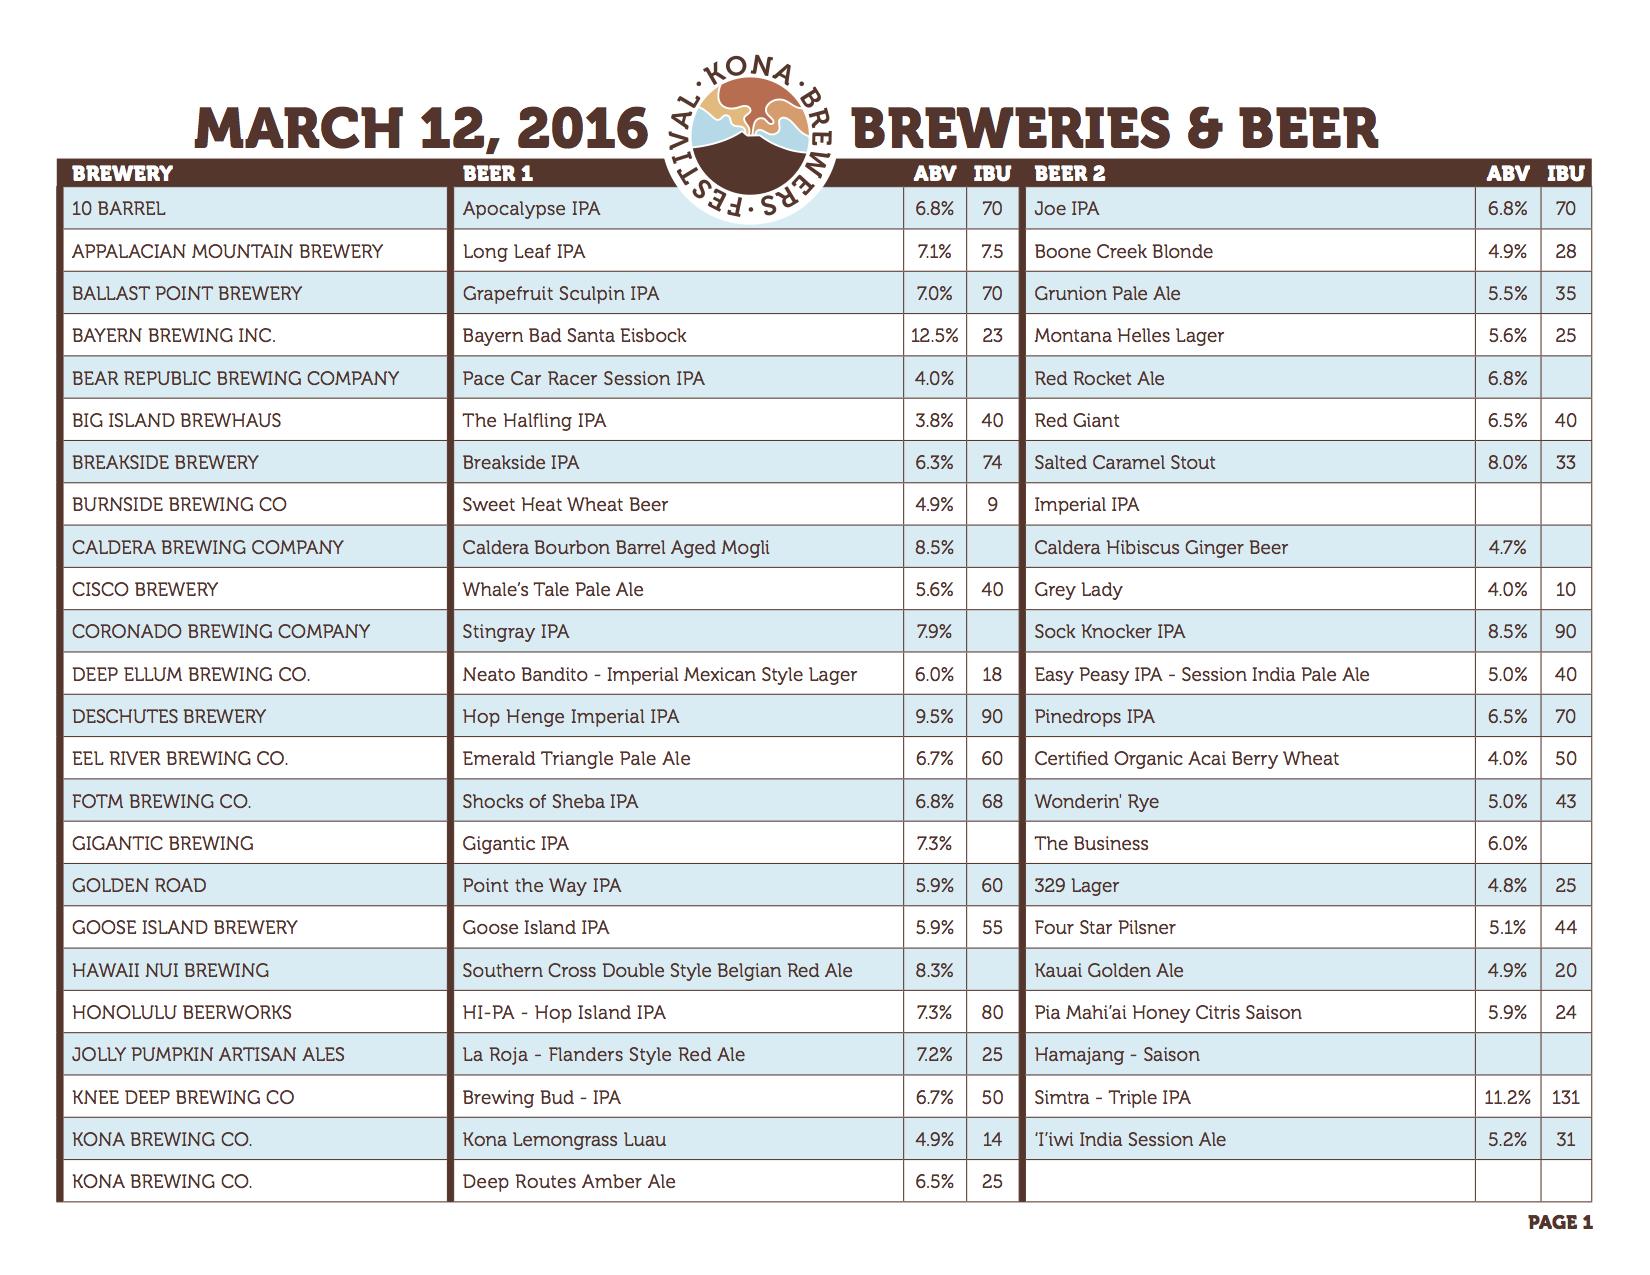 KBF2016_BreweryChart_r6